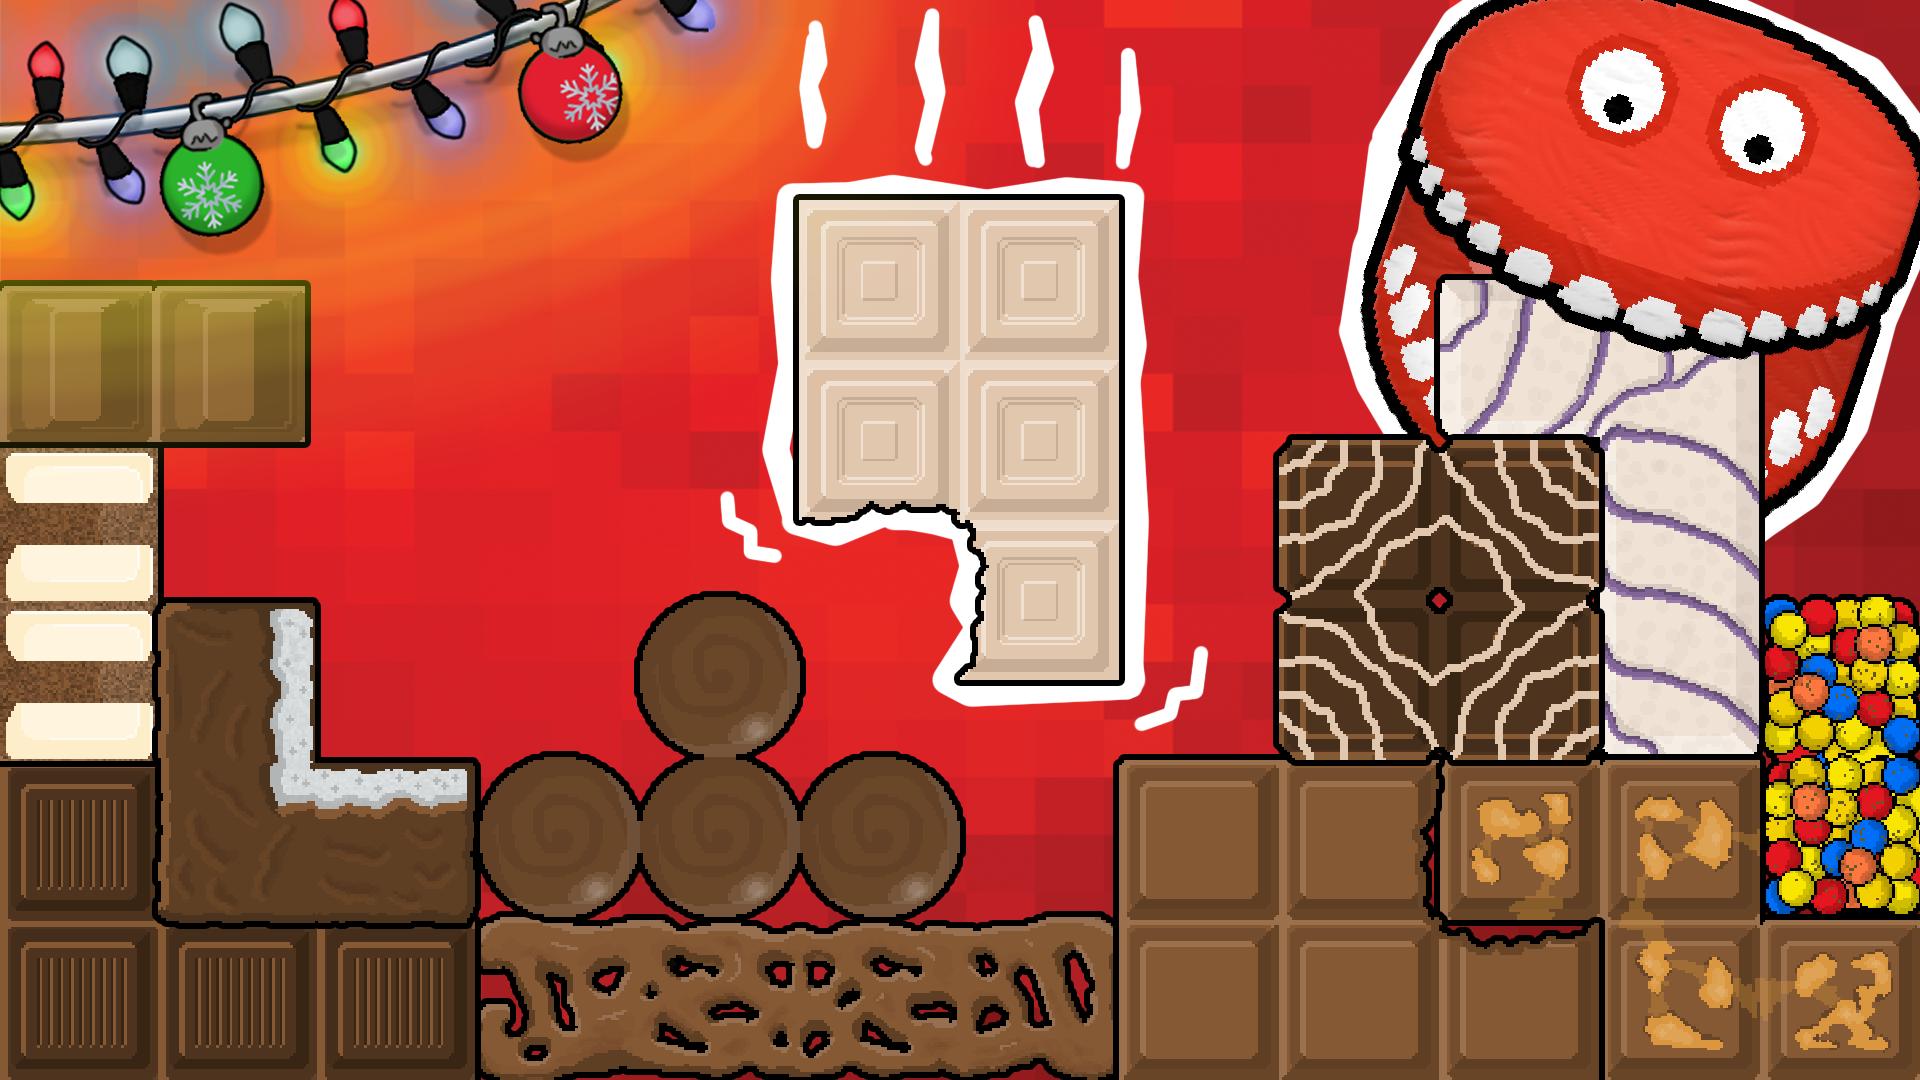 Play Chocoblocks!